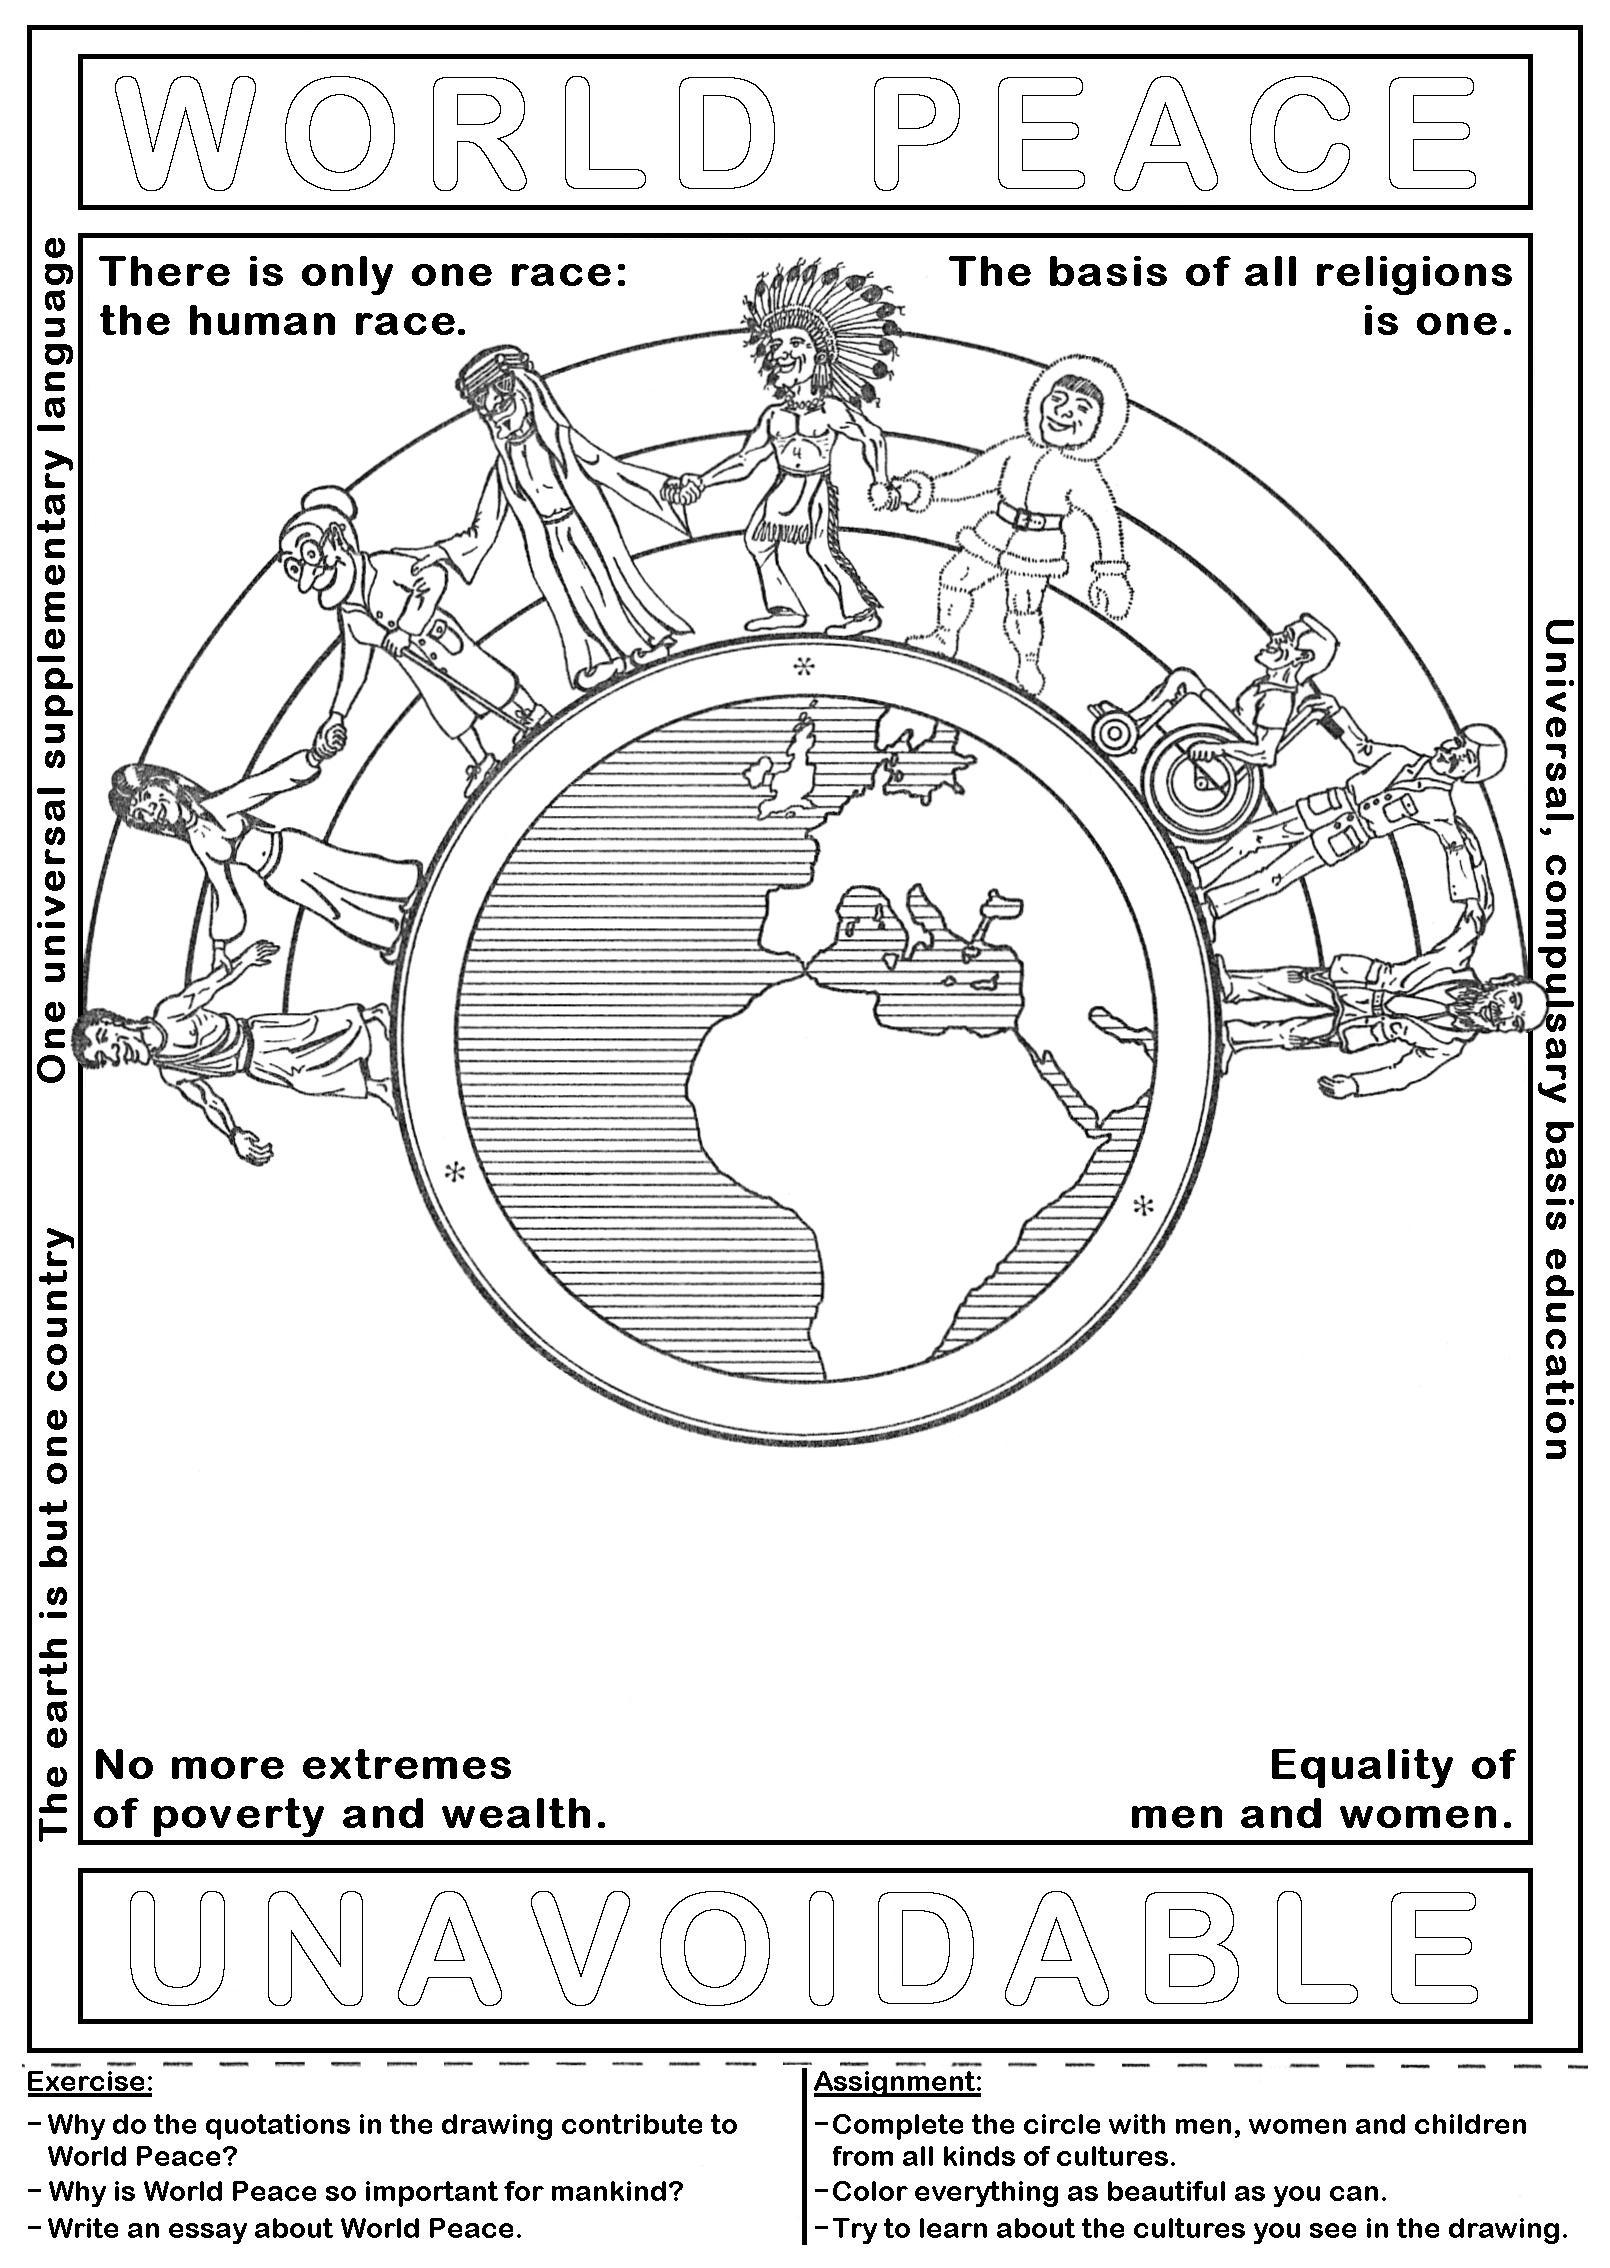 Ideal Artwork - Presentations - Drawing: World peace - half circle. TZ32